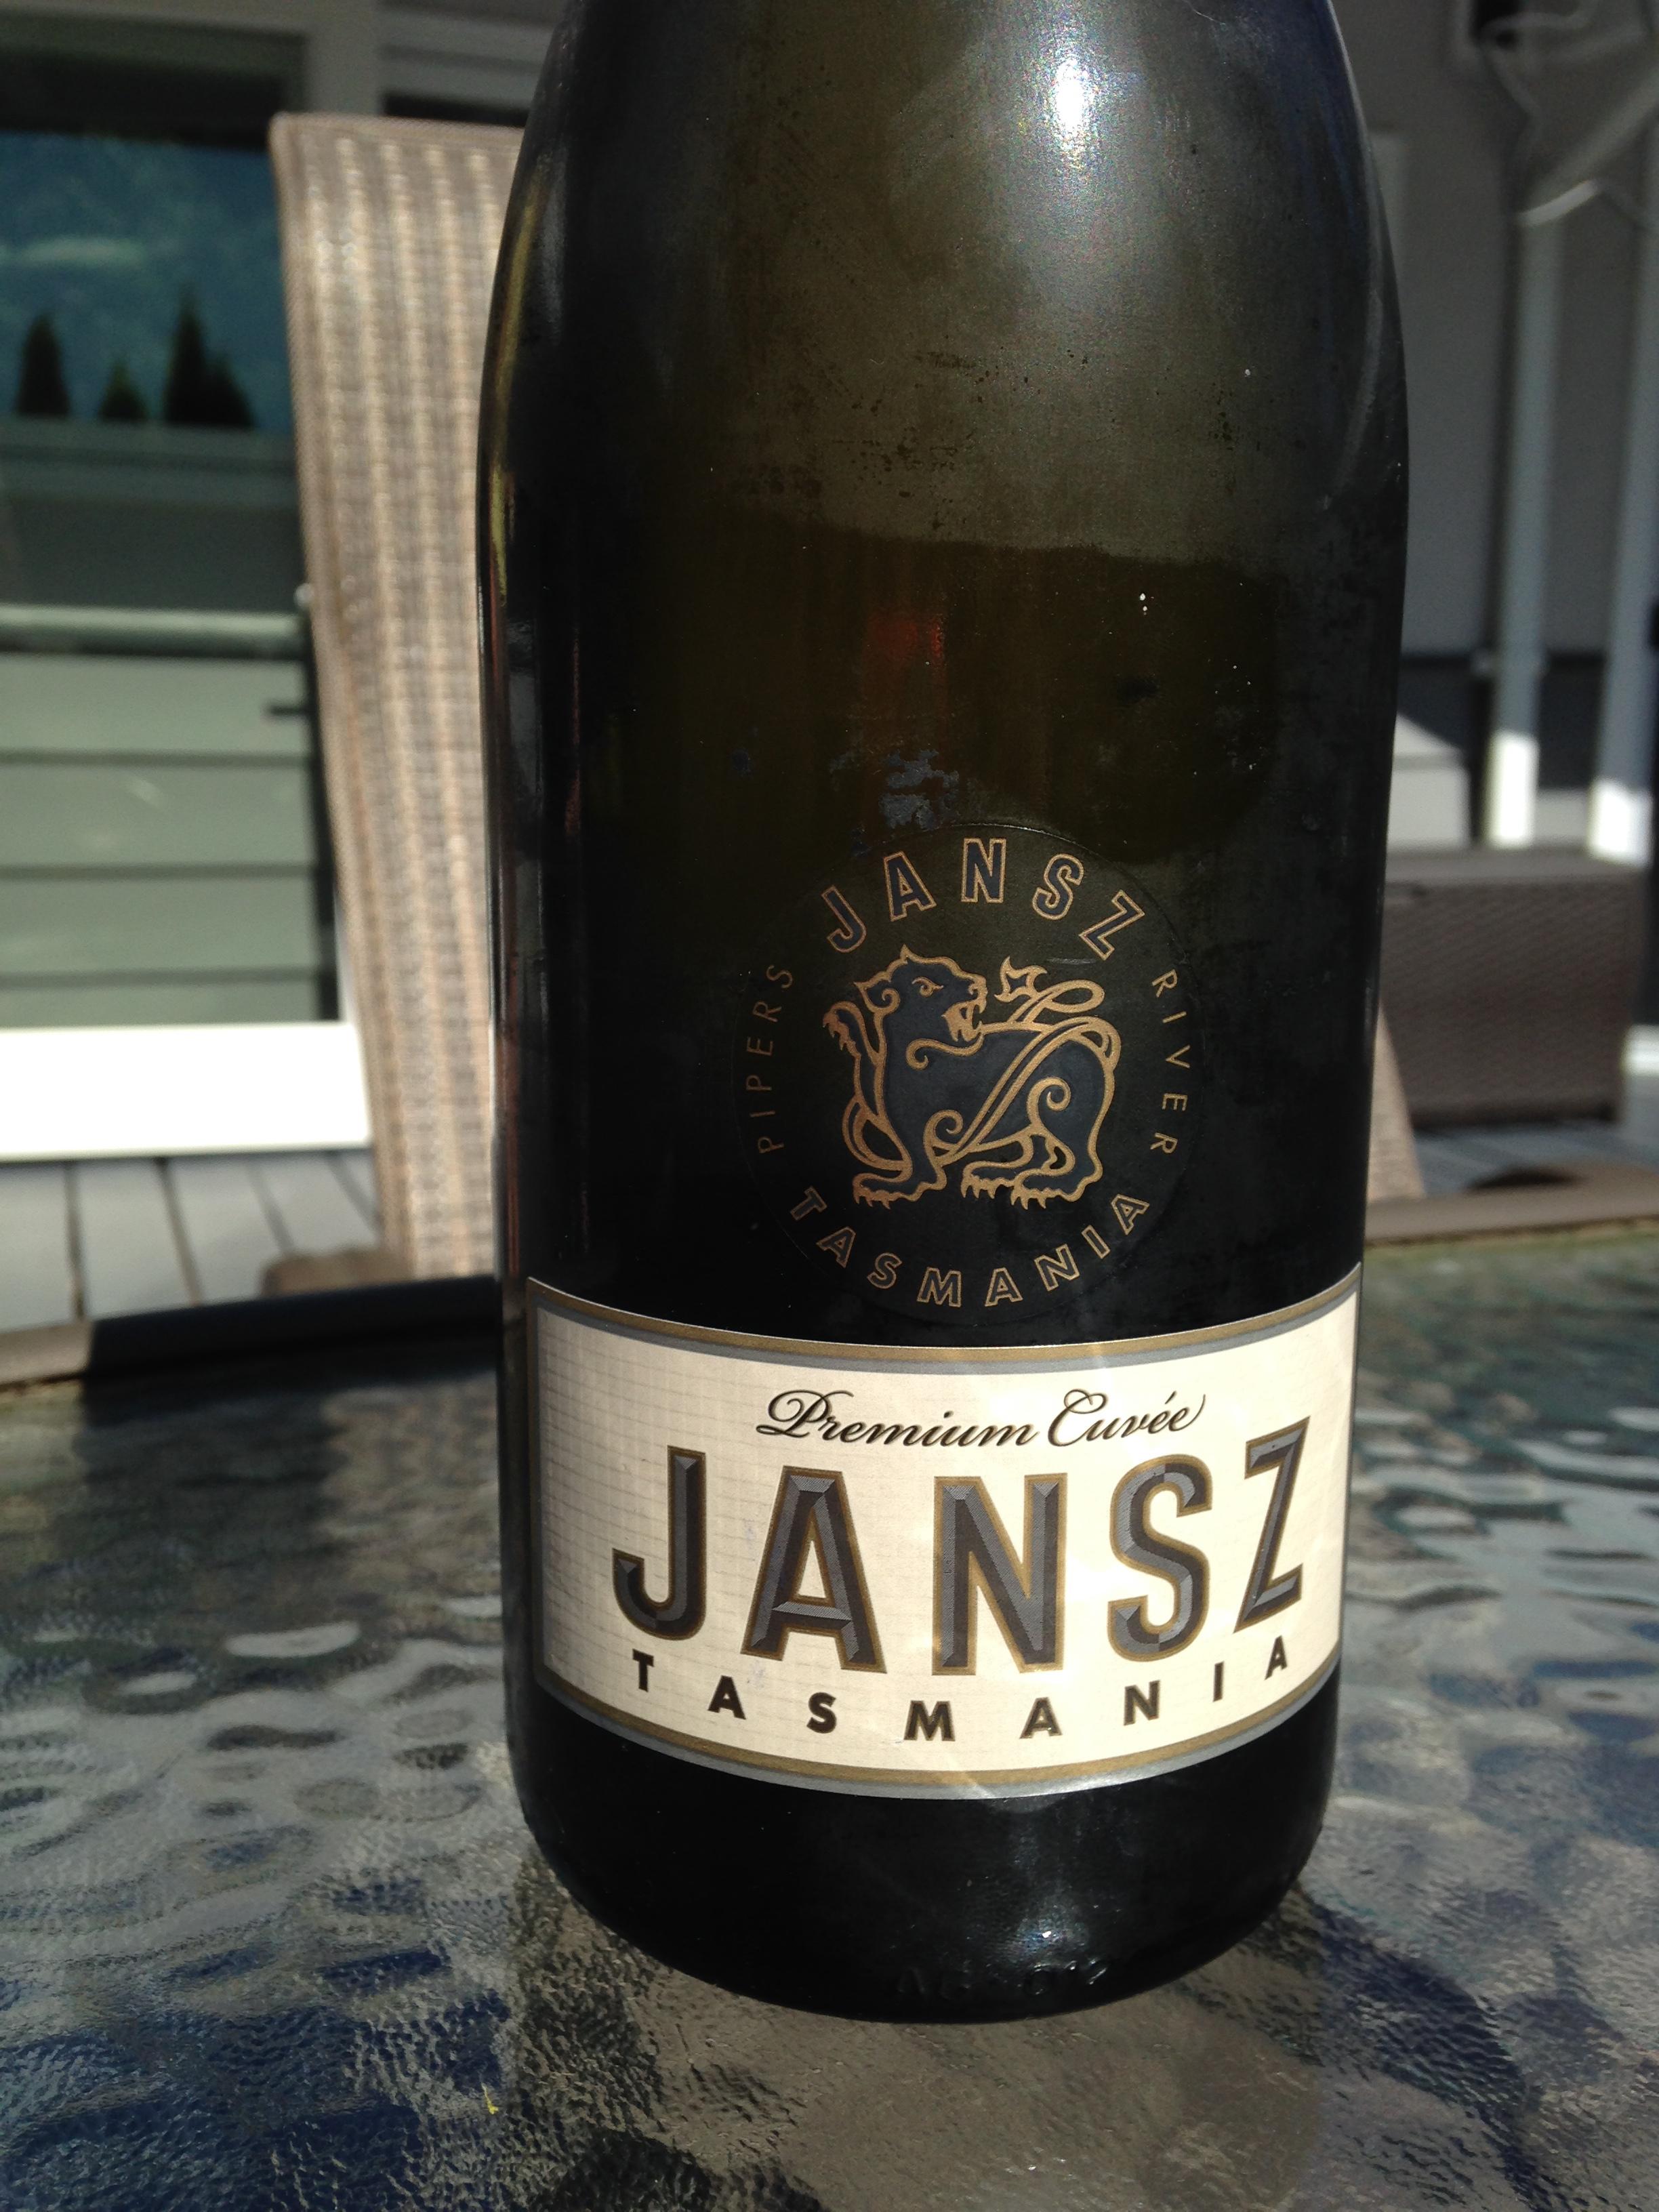 Delightful Tasmanian Bubbles Jansz Premium Cuvee Girls Go Grape